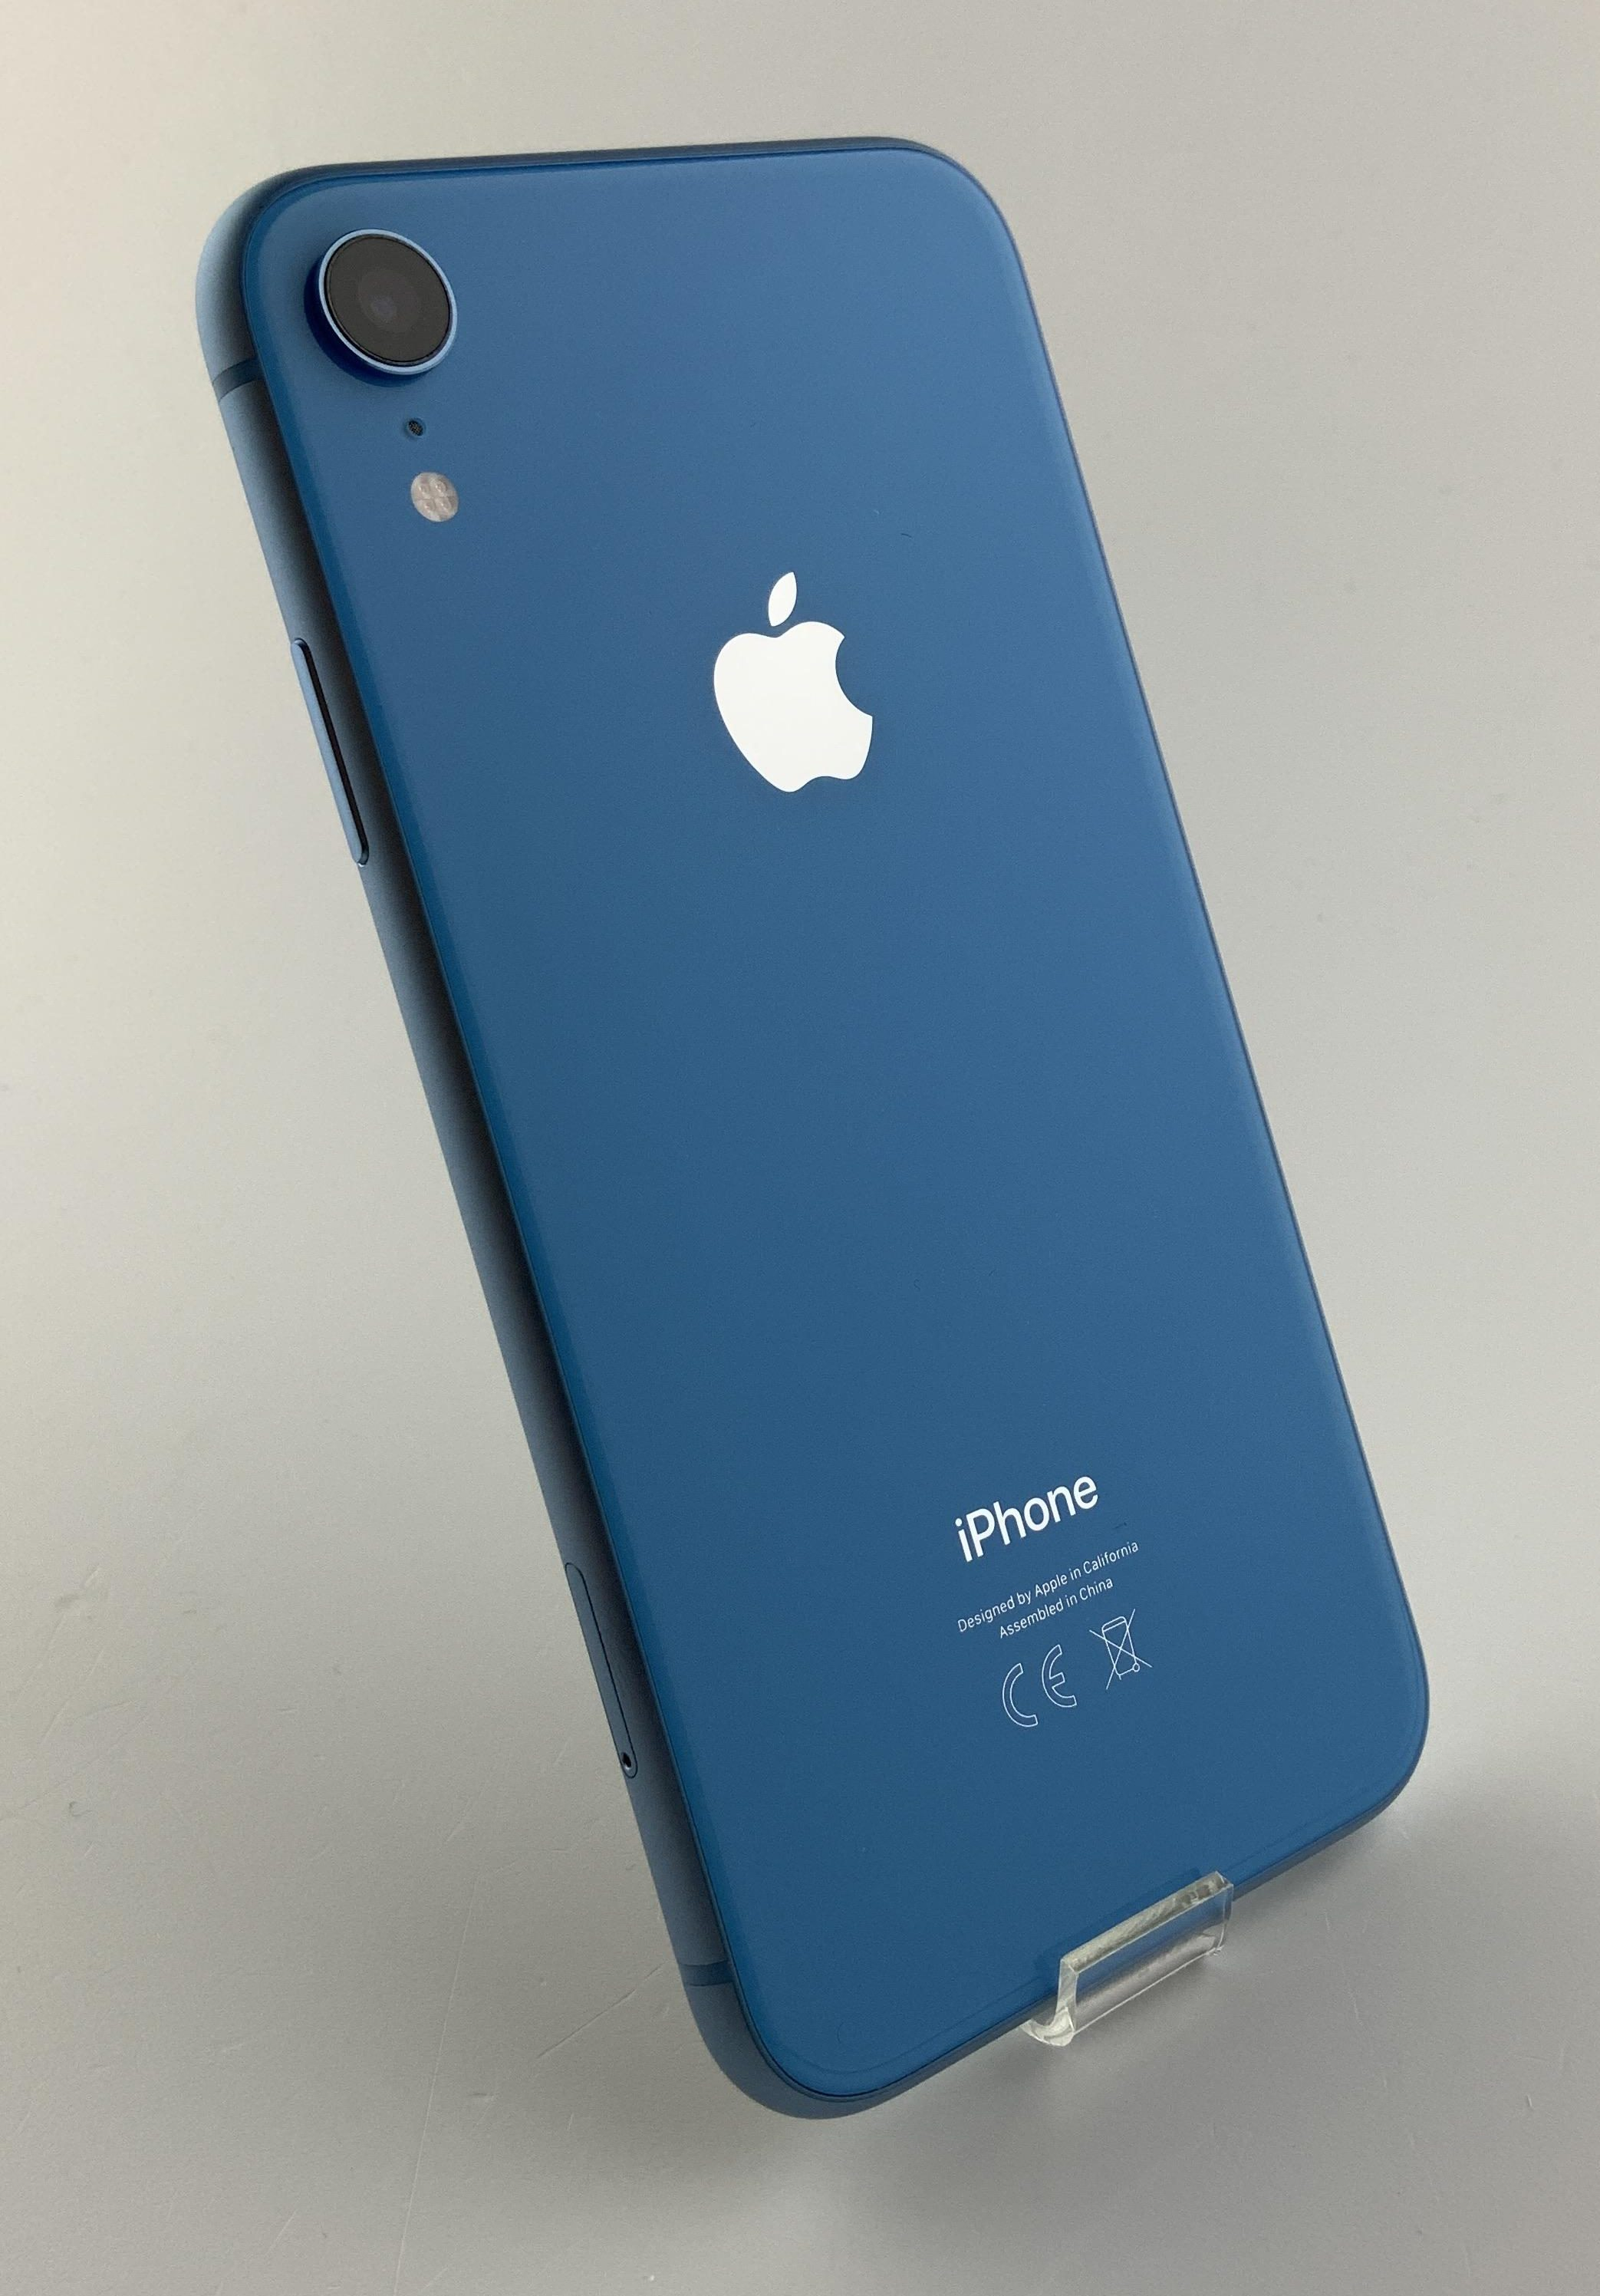 iPhone XR 64GB, 64GB, Blue, Afbeelding 2